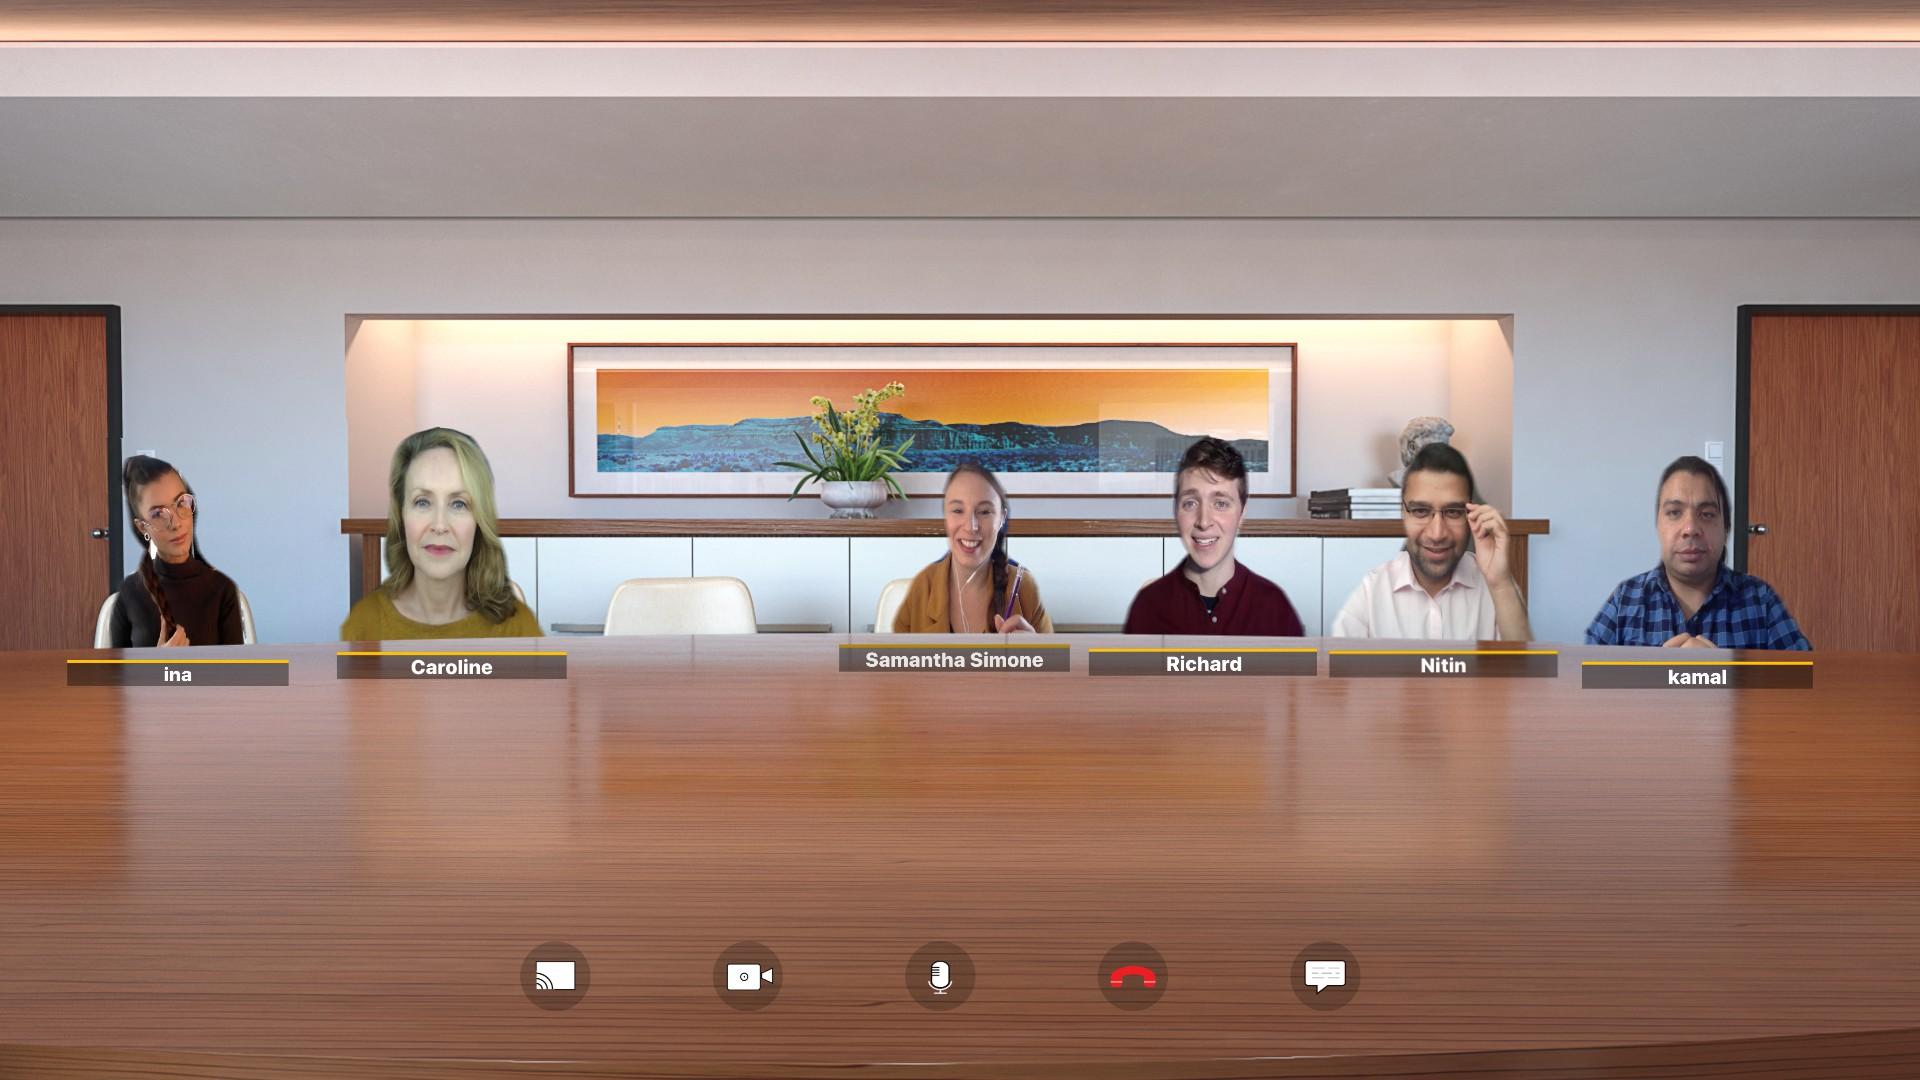 Custom designed virtual meeting rooms, Custom designed video conferencing room, Merimeet custom virtual meeting rooms, merimeet virtual conferencing room, merimeet auditorium virtual conferencing room, Club themed virtual conferencing room